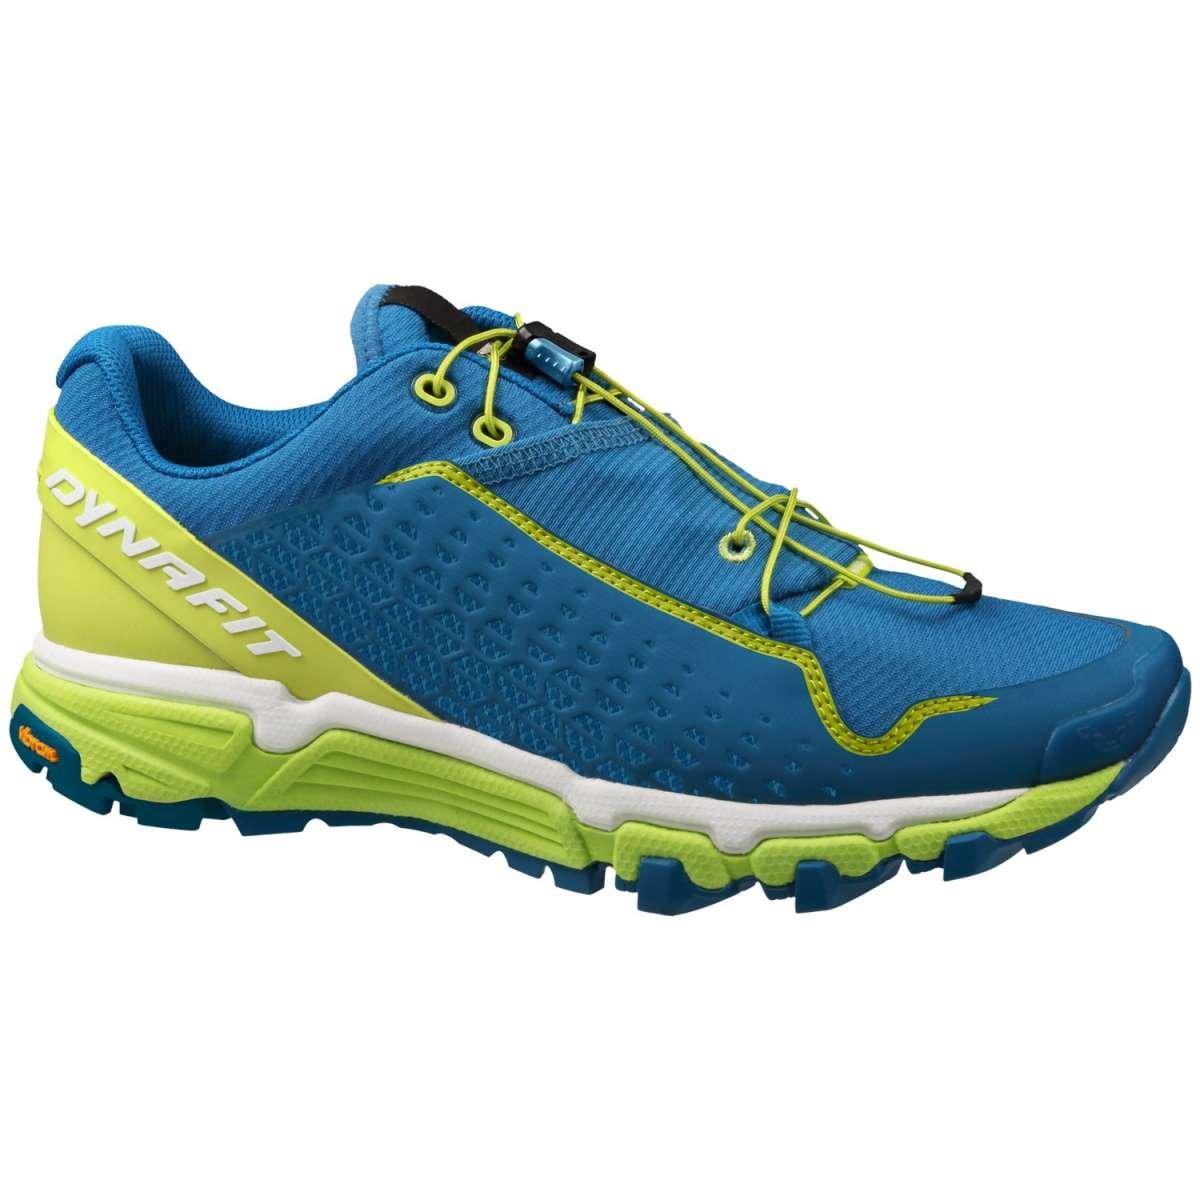 Ultra M Loisirs HommeSports Et Chaussures Pro Trail v0mnN8w